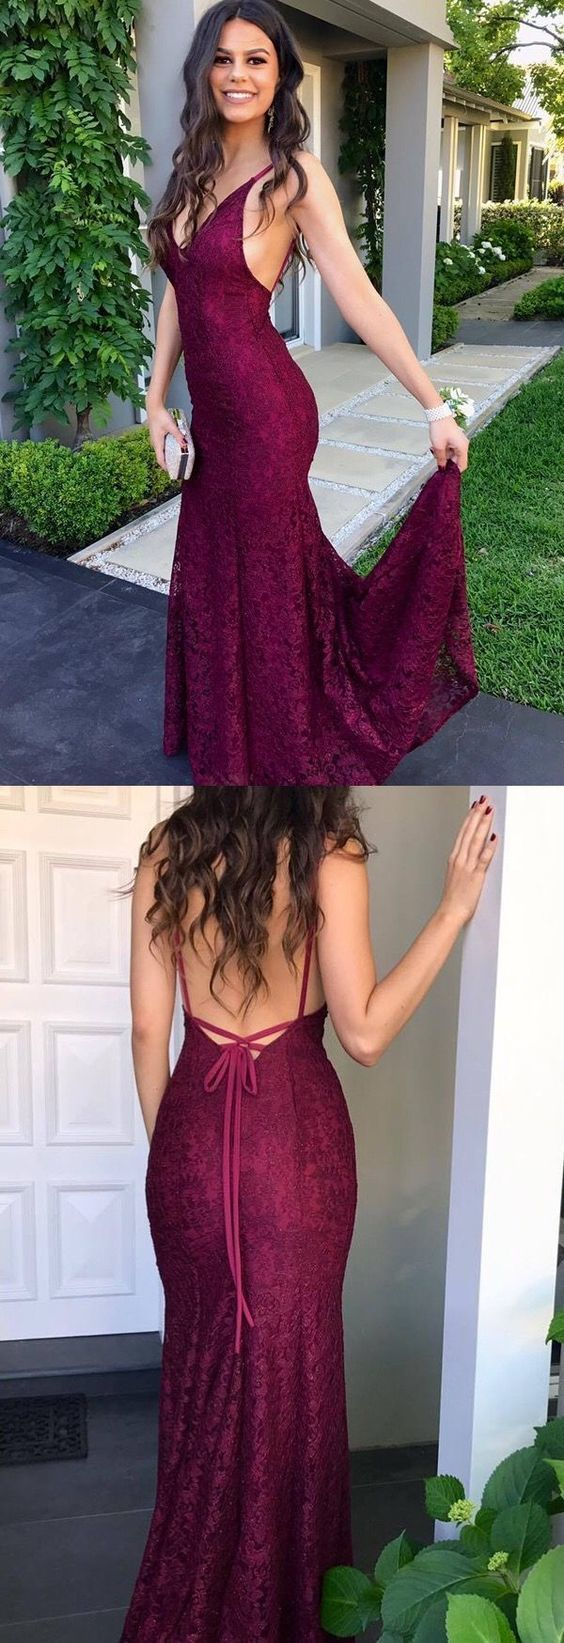 Simple burgundy lace prom dresses elegant mermaid backless wedding